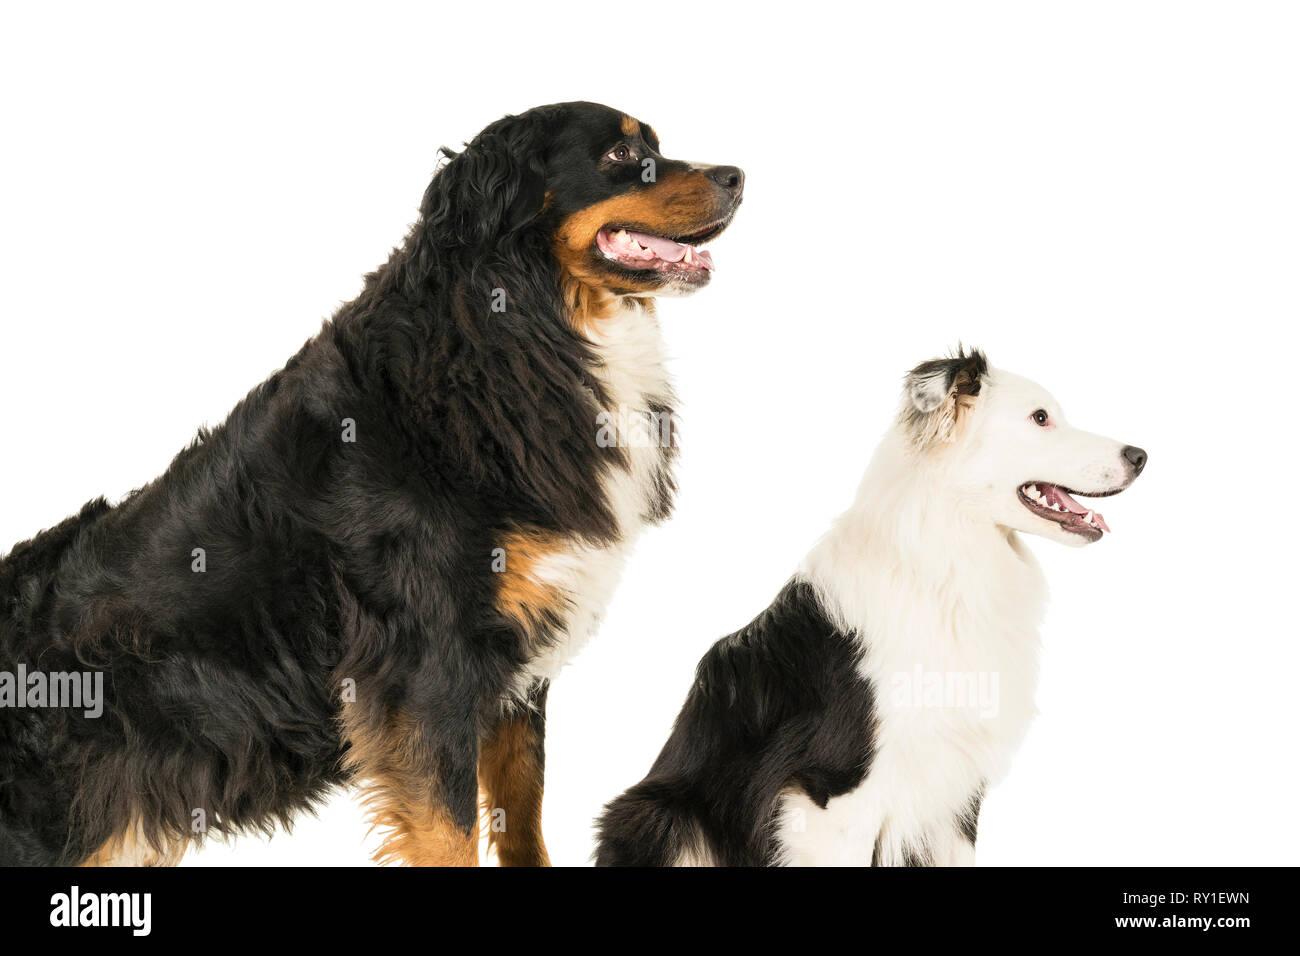 Berner Sennen Mountain And Australian Shepherd Dog Standing